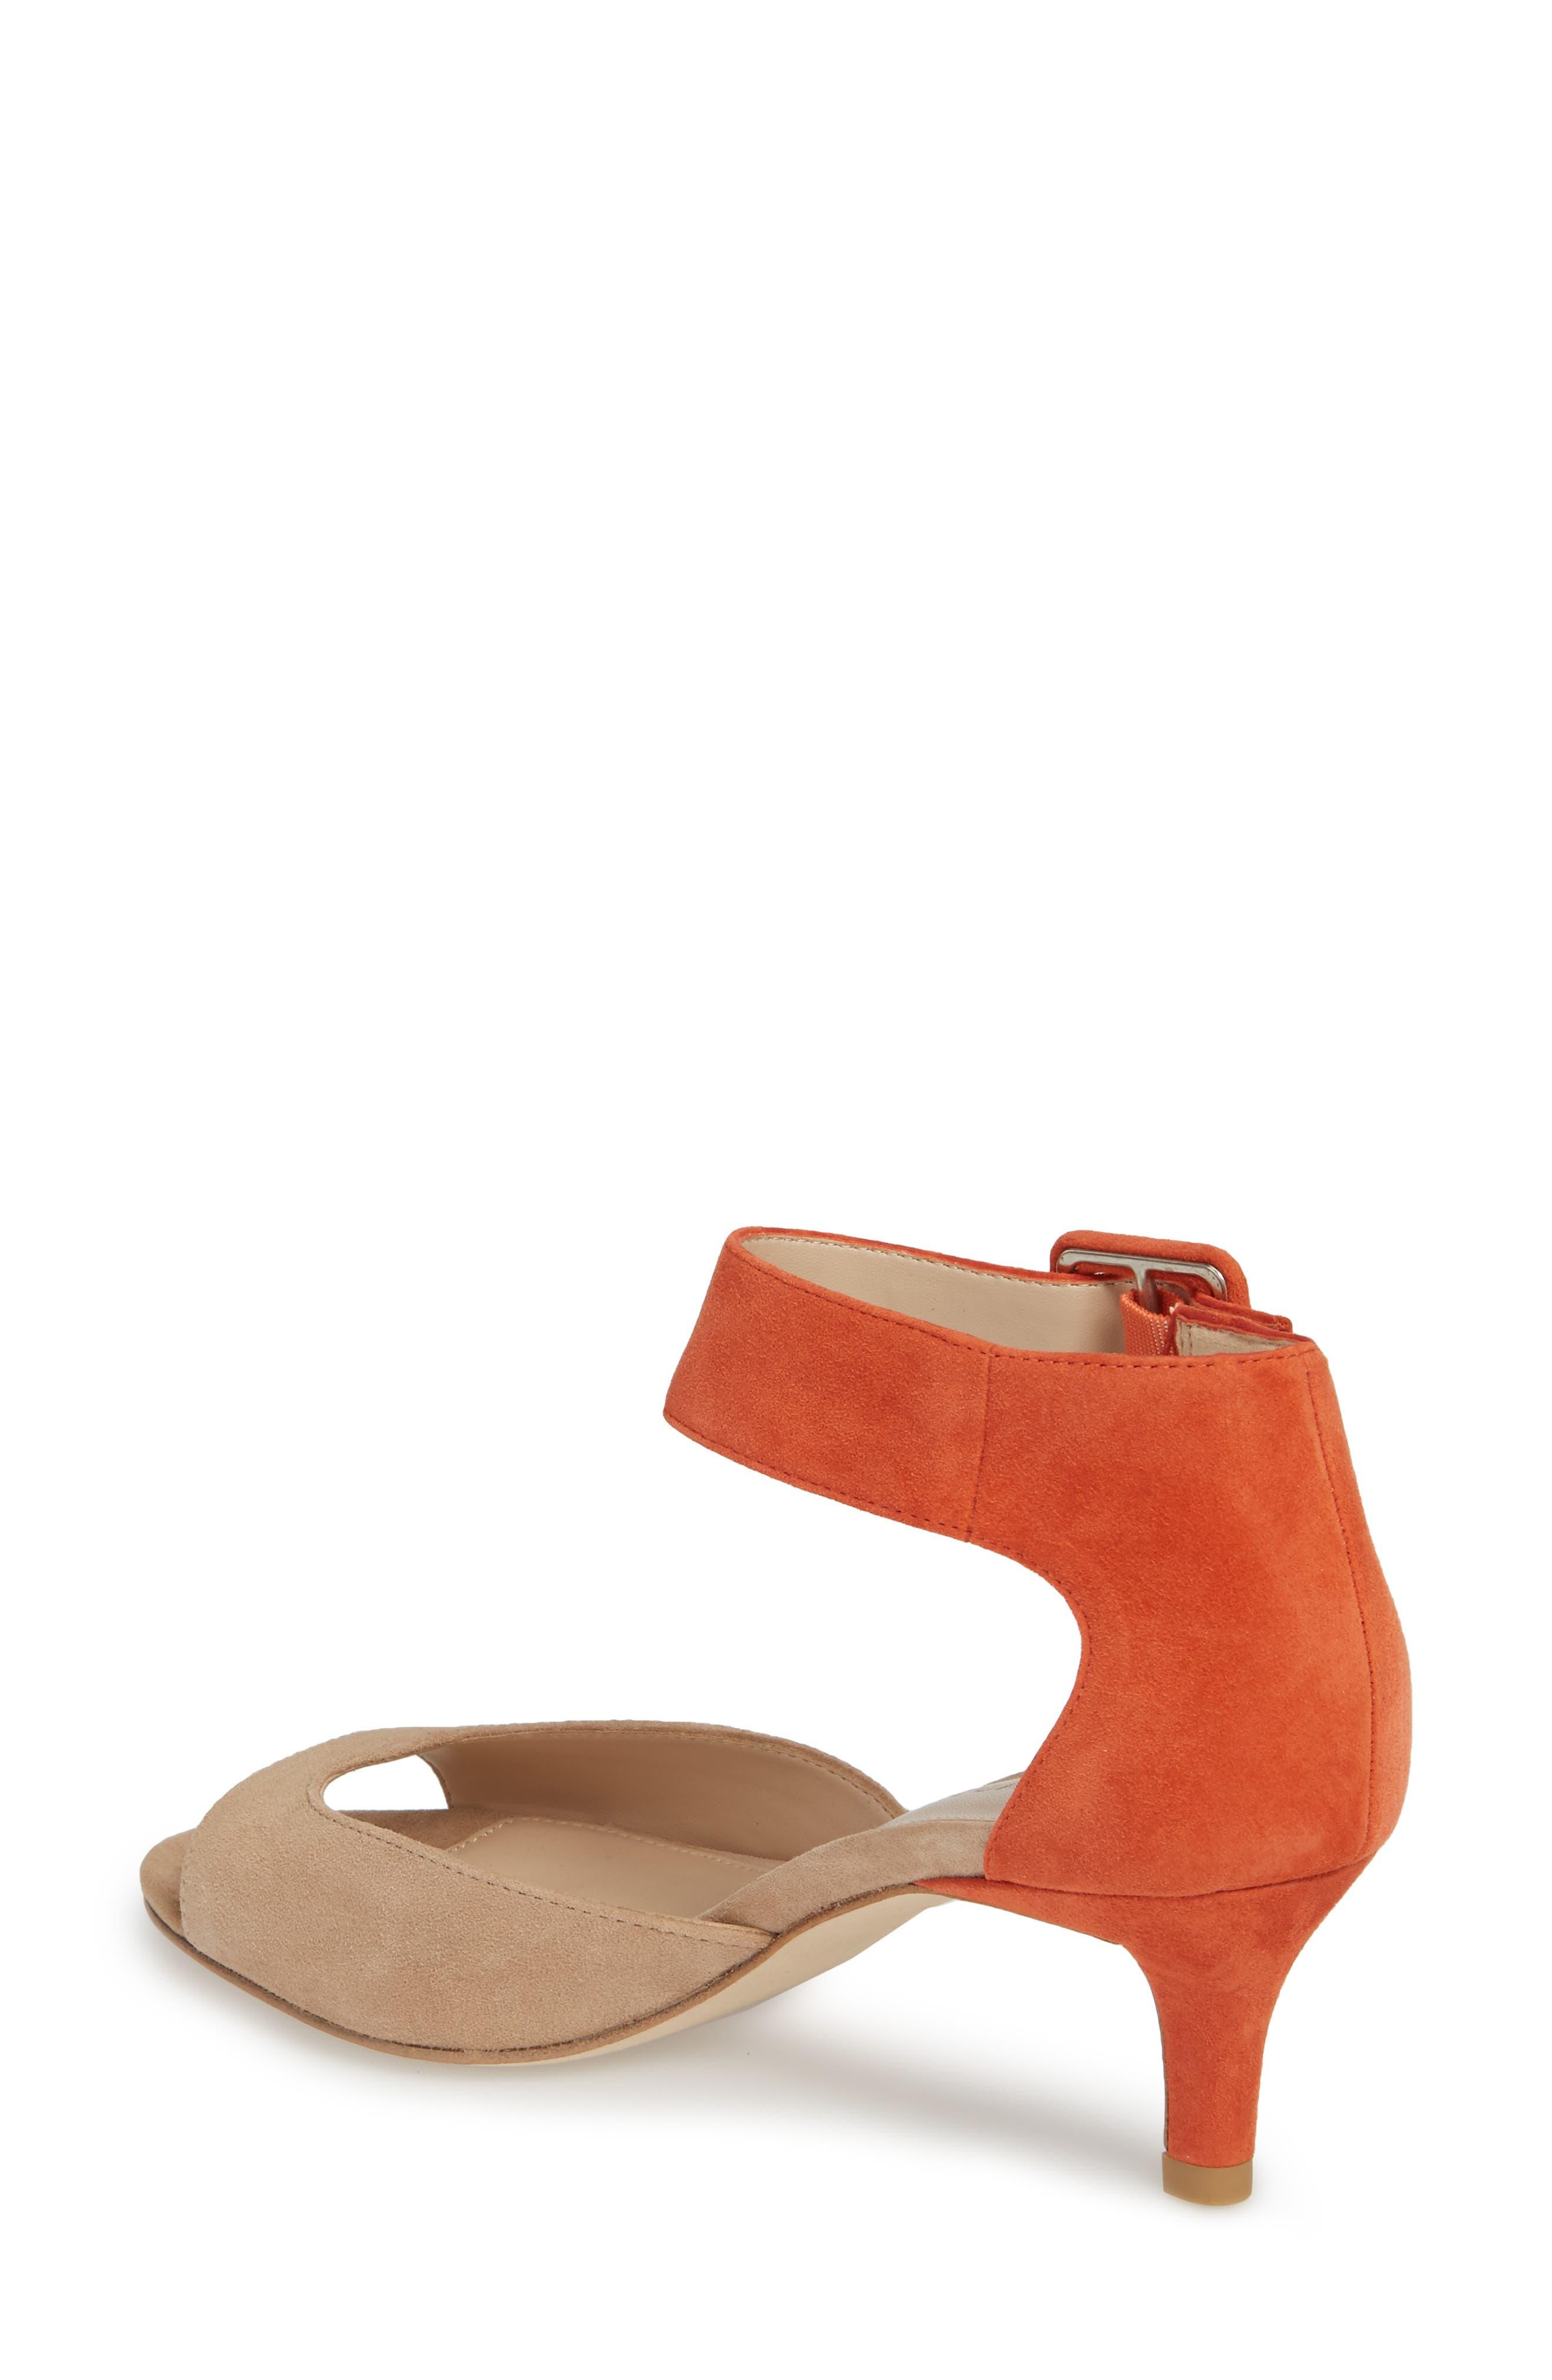 'Berlin' Ankle Strap Sandal,                             Alternate thumbnail 14, color,